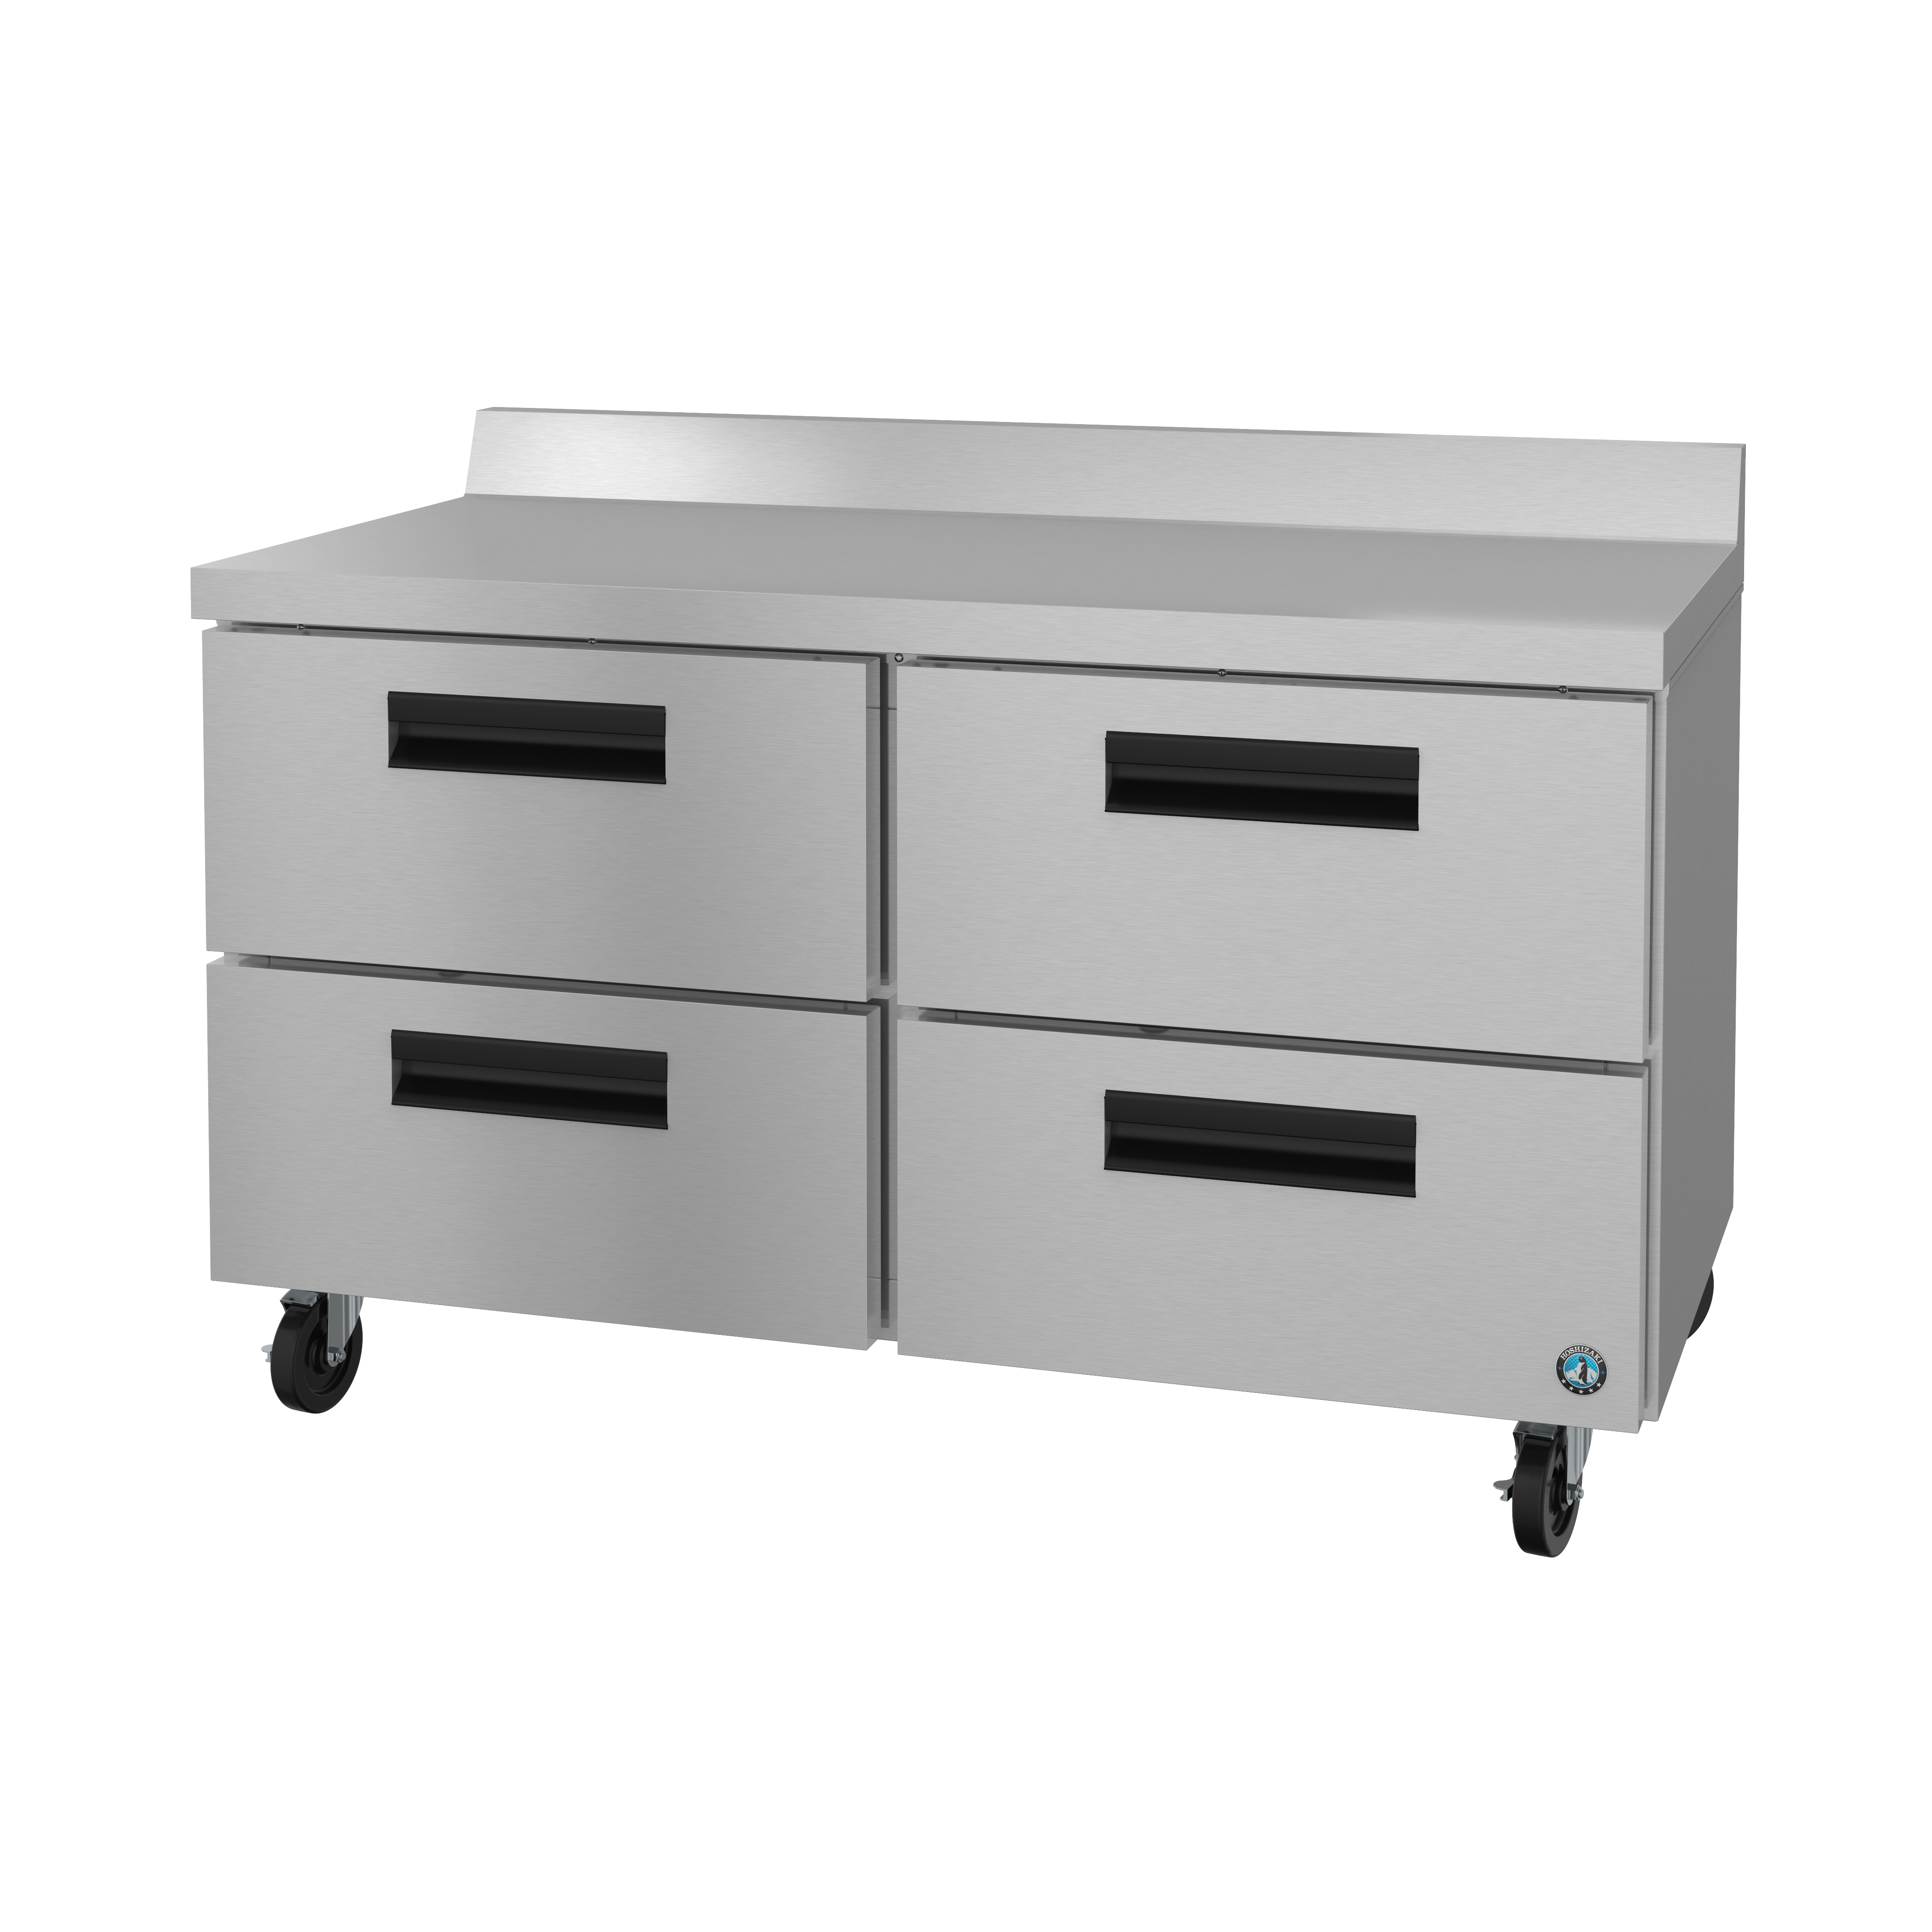 Hoshizaki WF48A-D4 freezer counter, work top